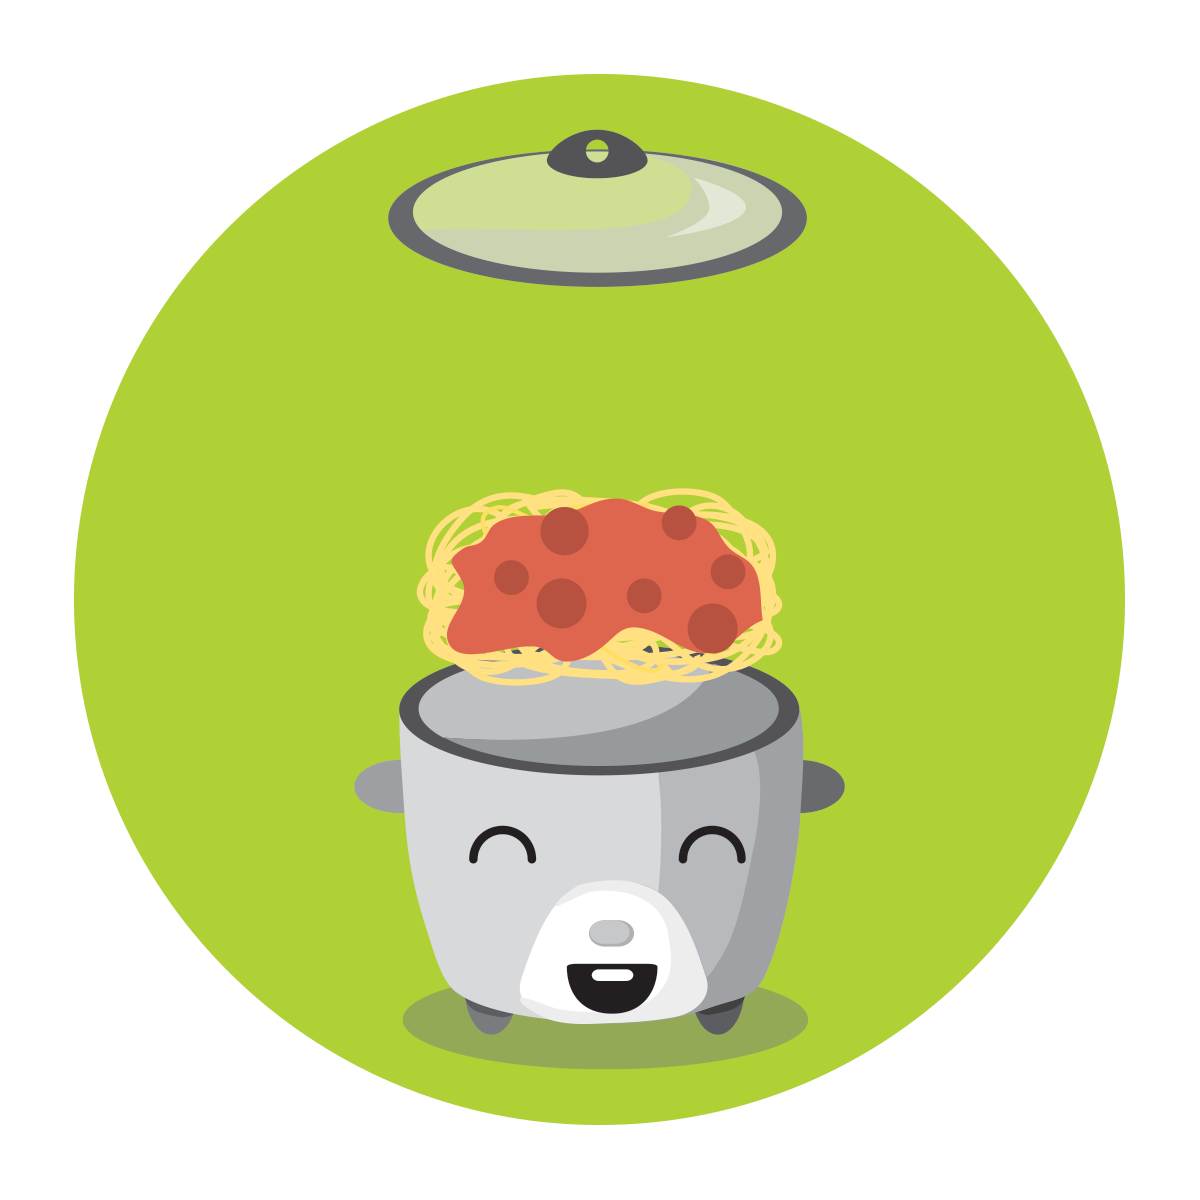 ricecooker_spaghetti